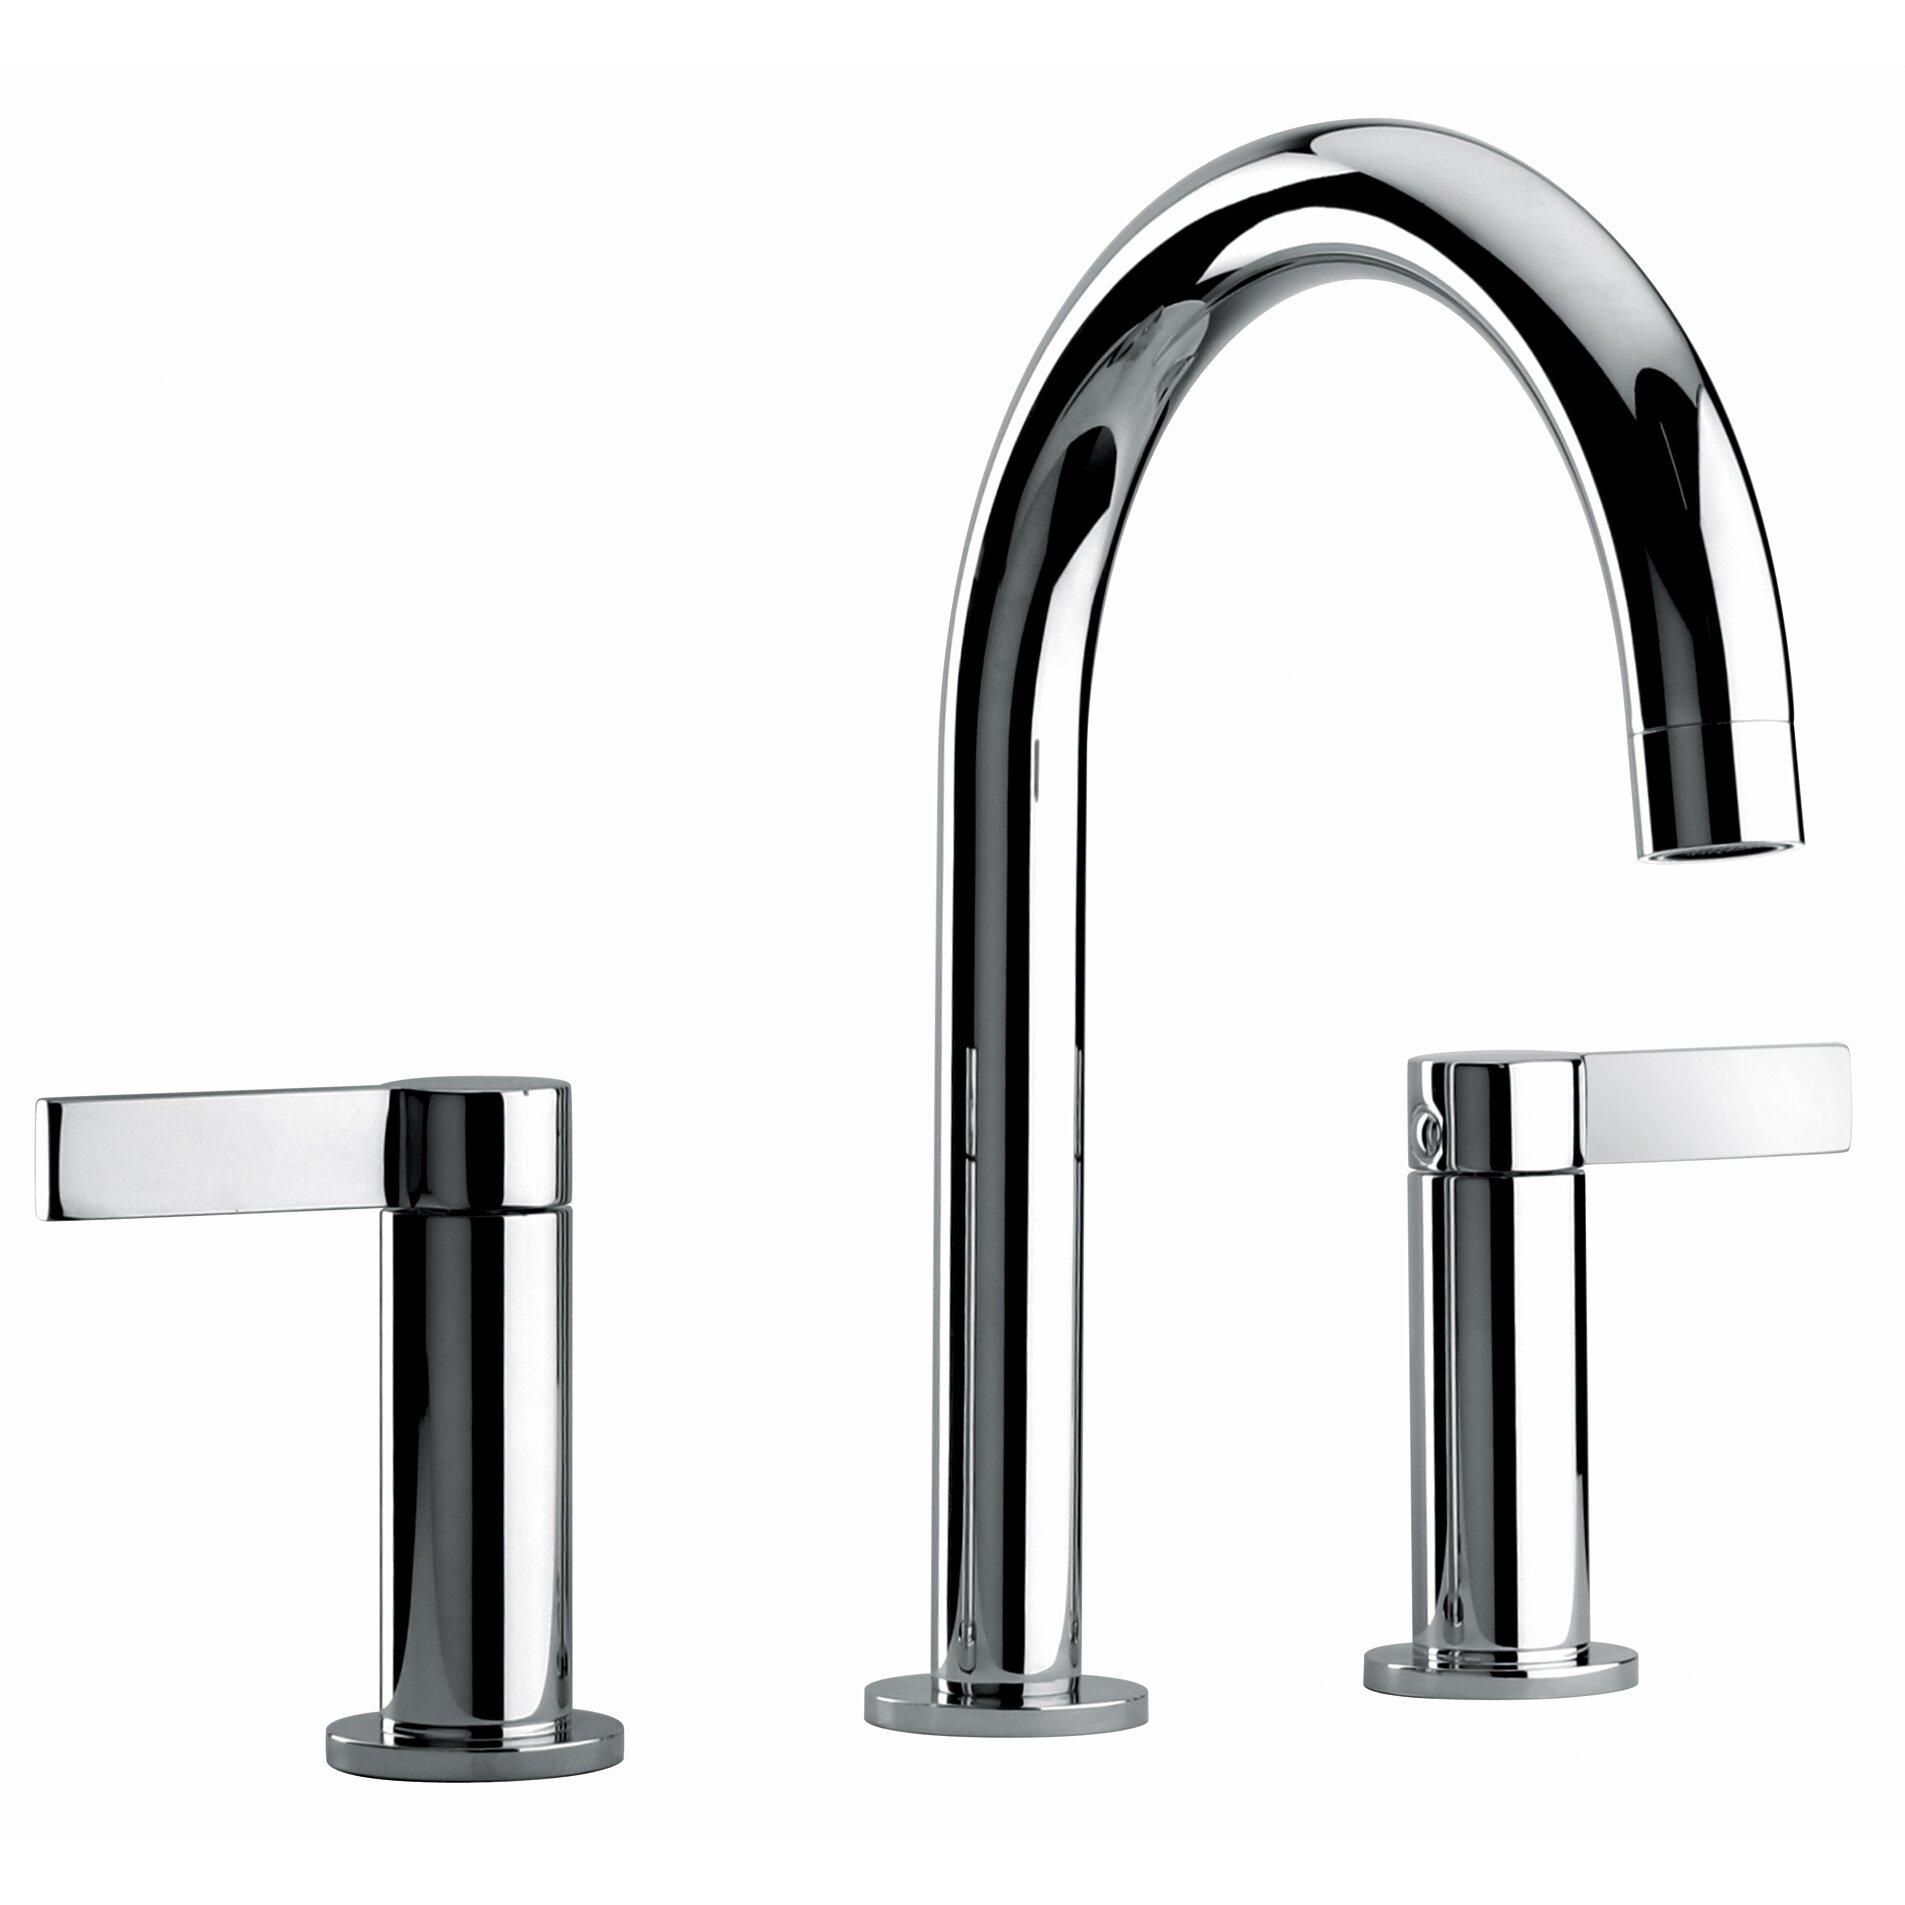 Faucets J14 Bath Series Two Lever Handle Widespread Bathroom Faucet ...